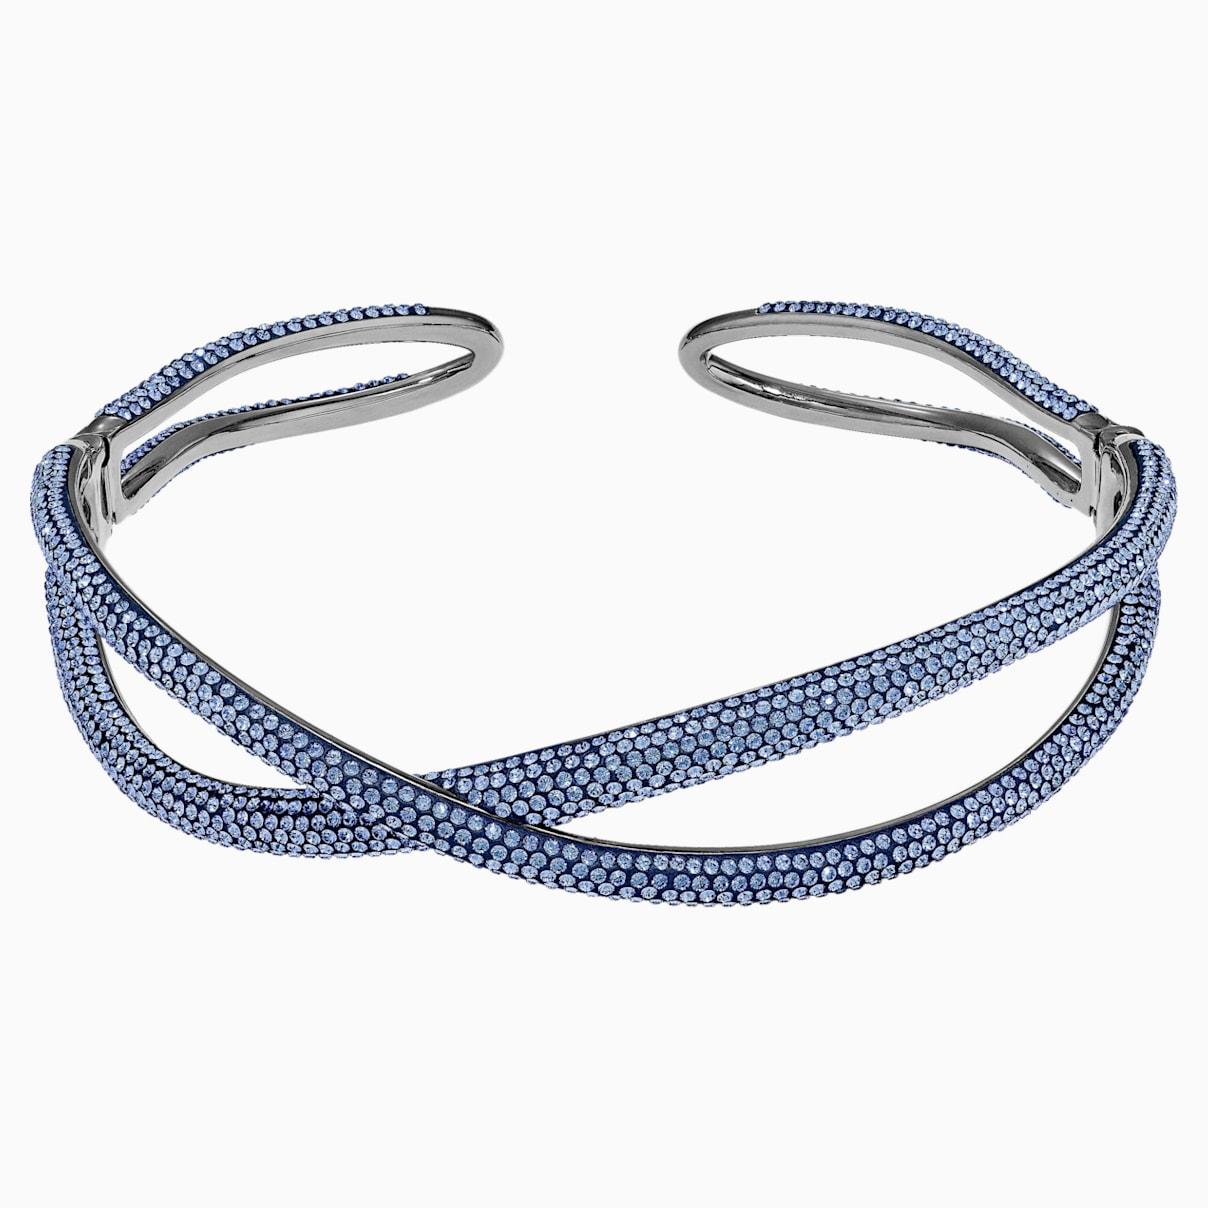 Ras-de-cou Tigris, bleu, métal plaqué ruthénium